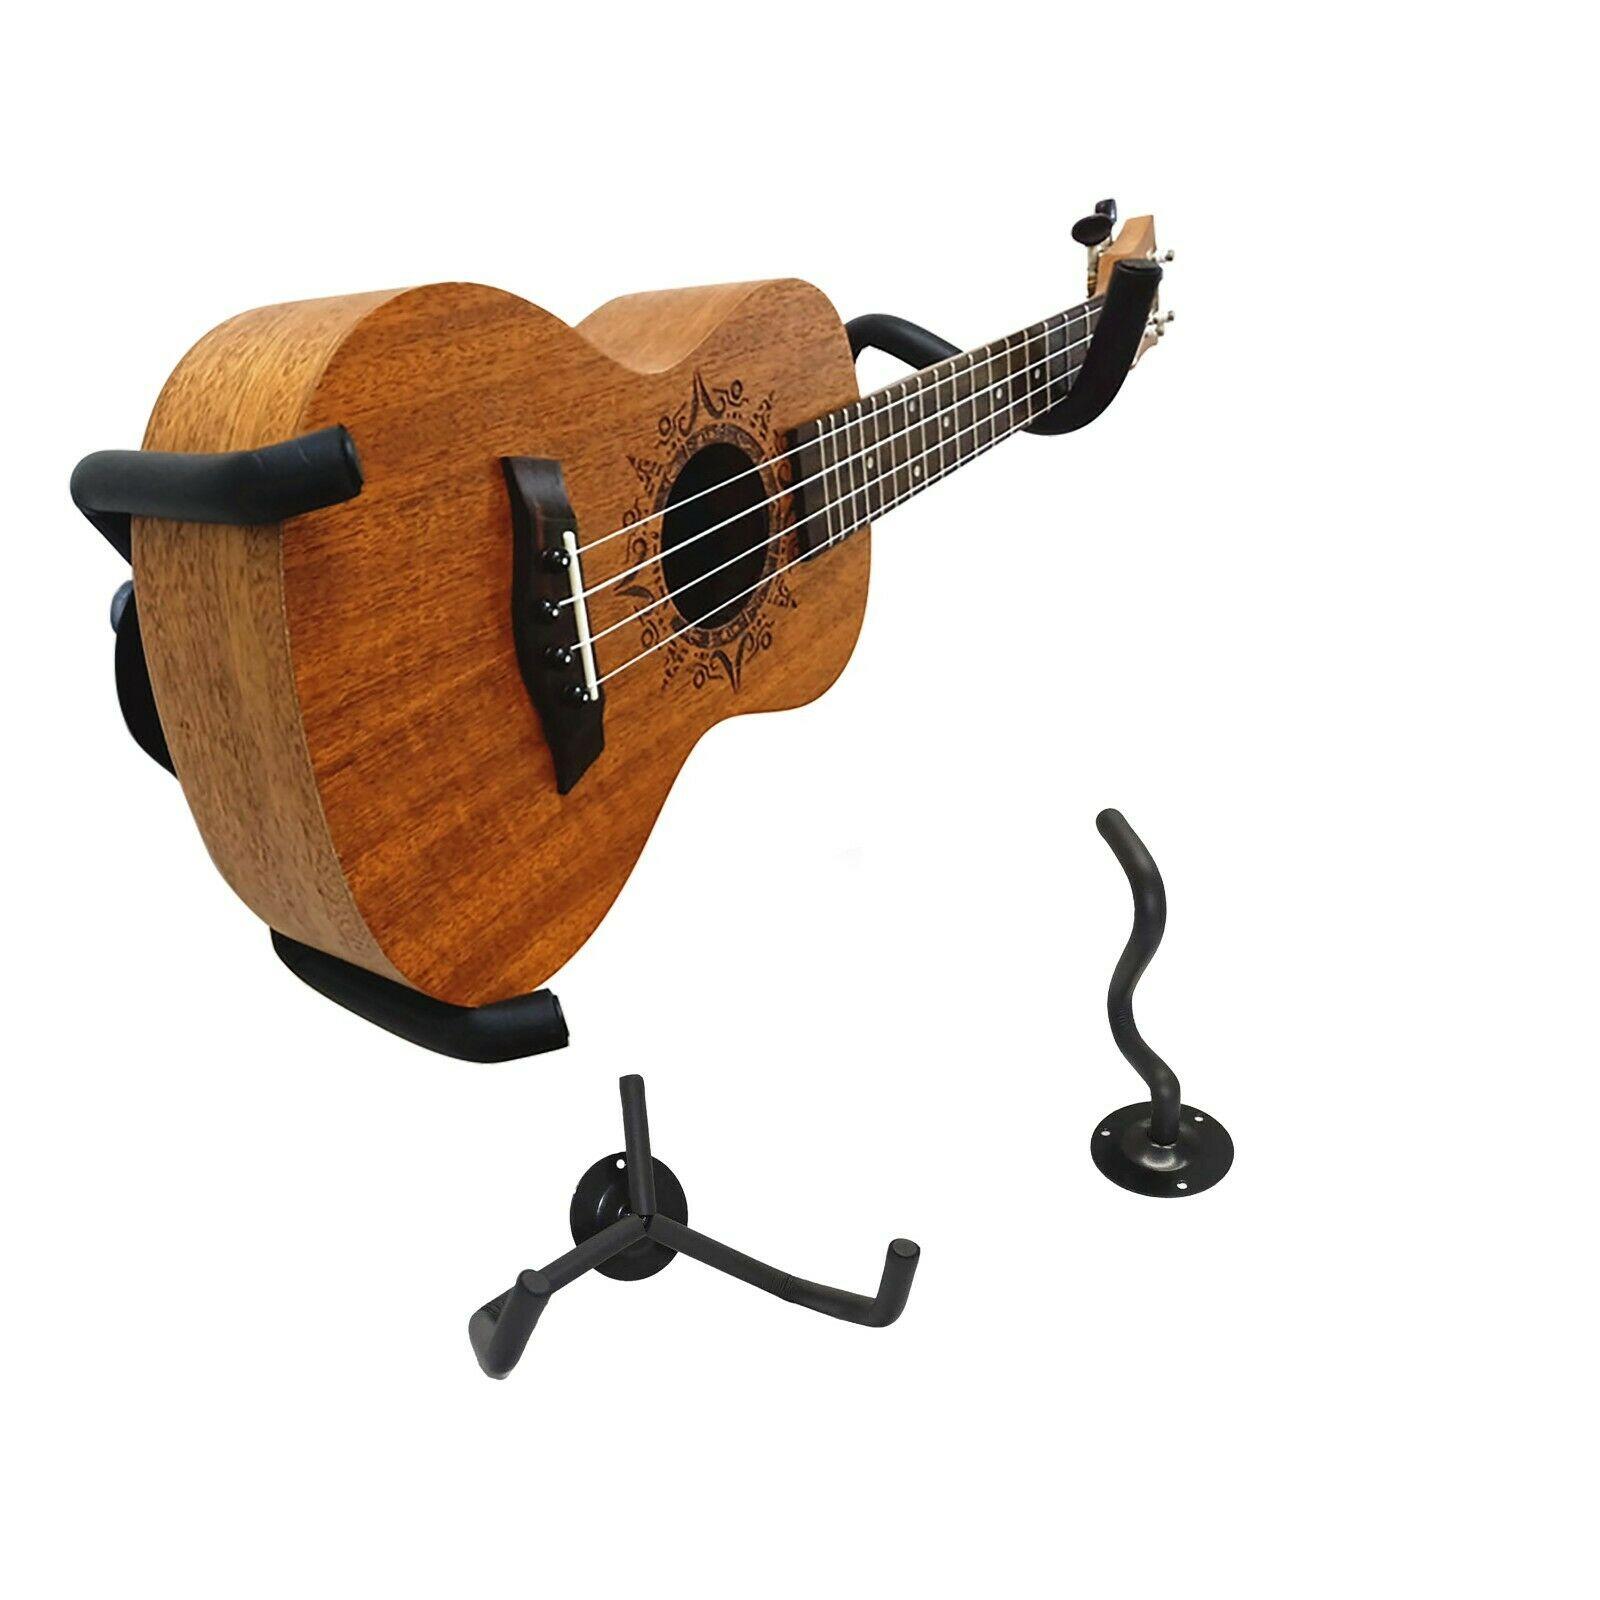 Colgador de pared para ukelele, Mandolin y Banjo, soporte de ukelele, gancho Horizontal de Slatwall